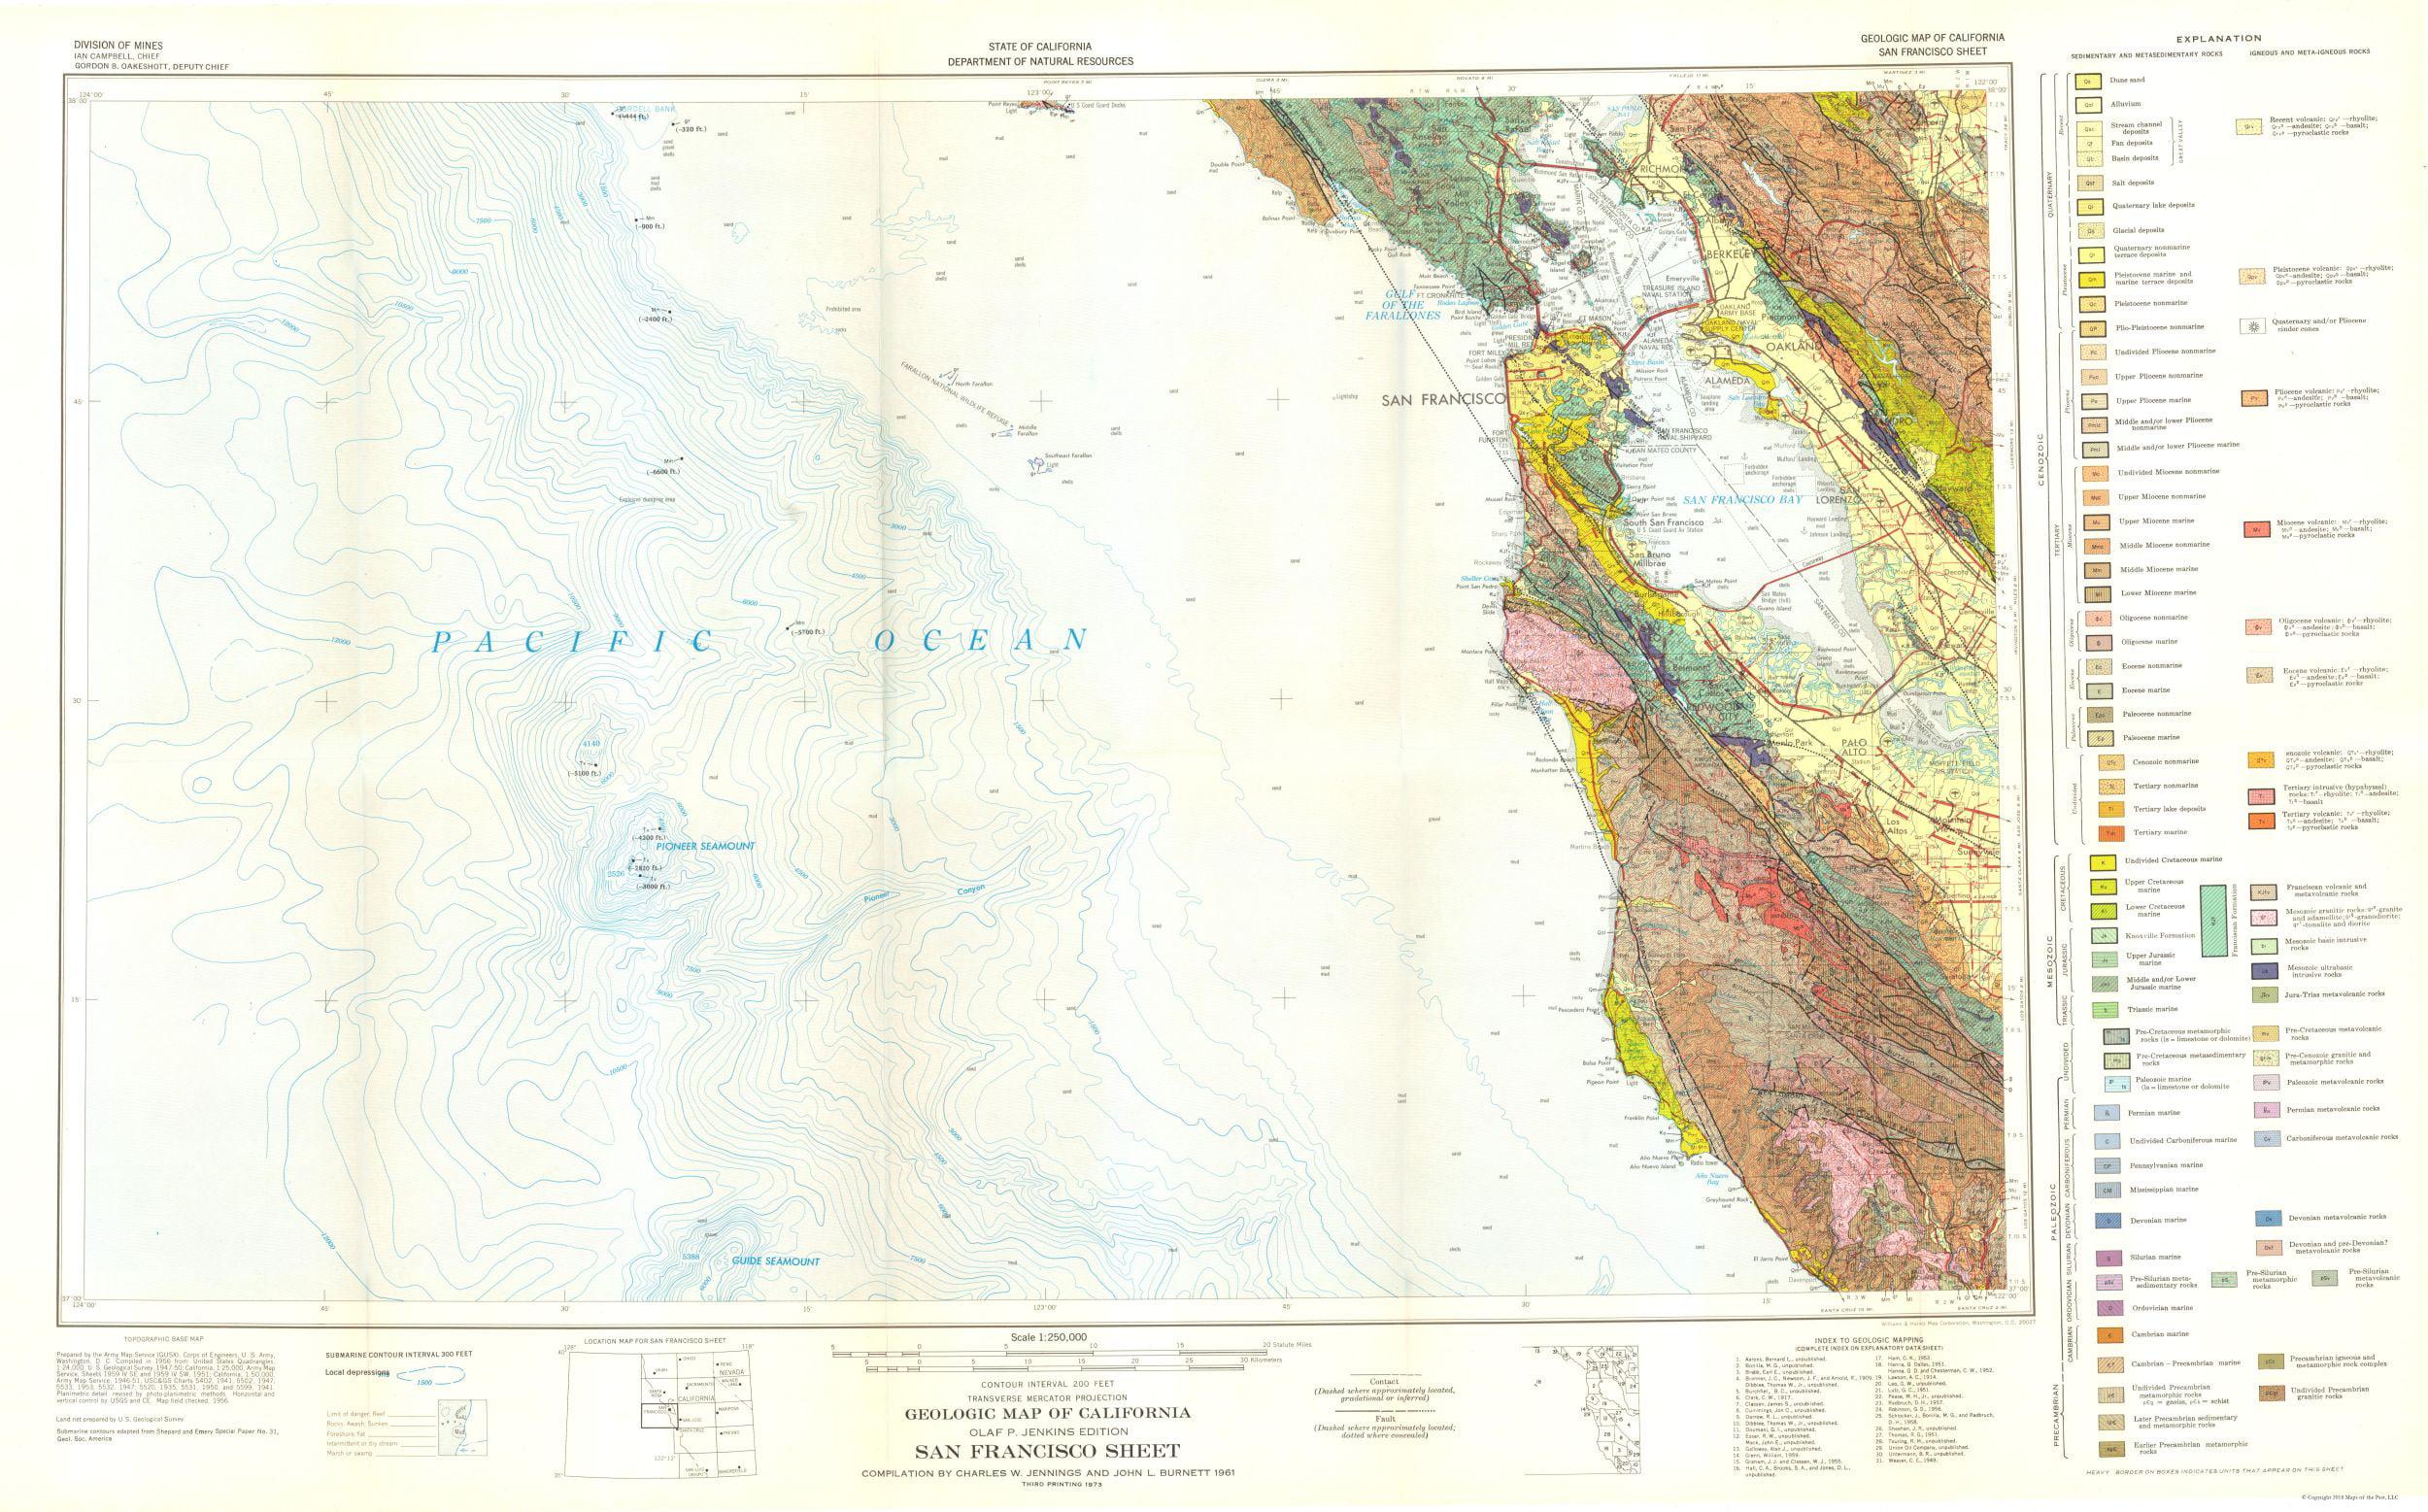 Mining Map - San Francisco California Sheet - CA Mines 1956 - 36 92 x 23